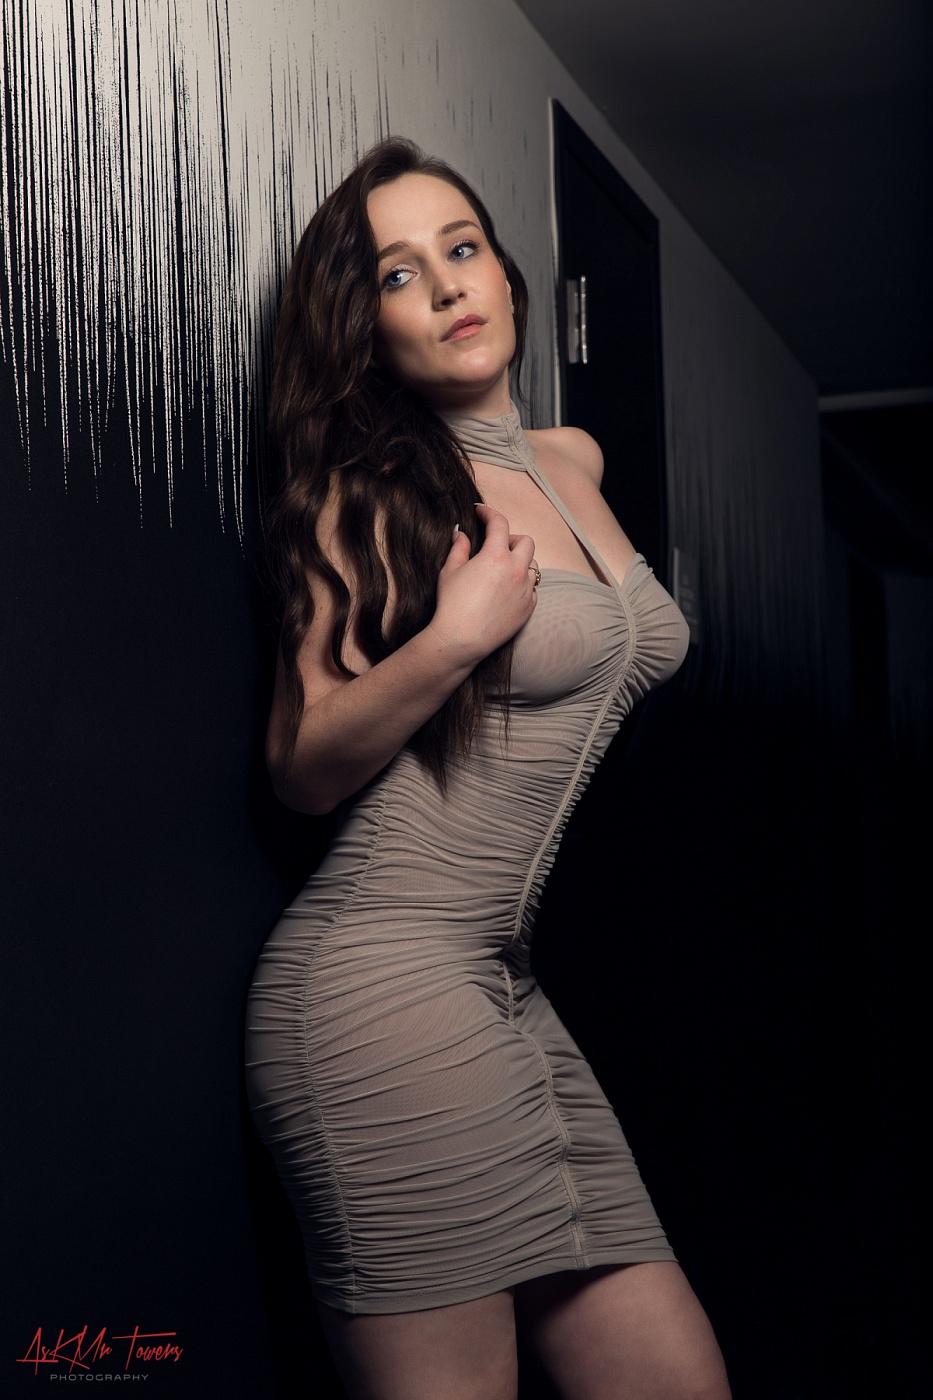 Aleksandra Reign